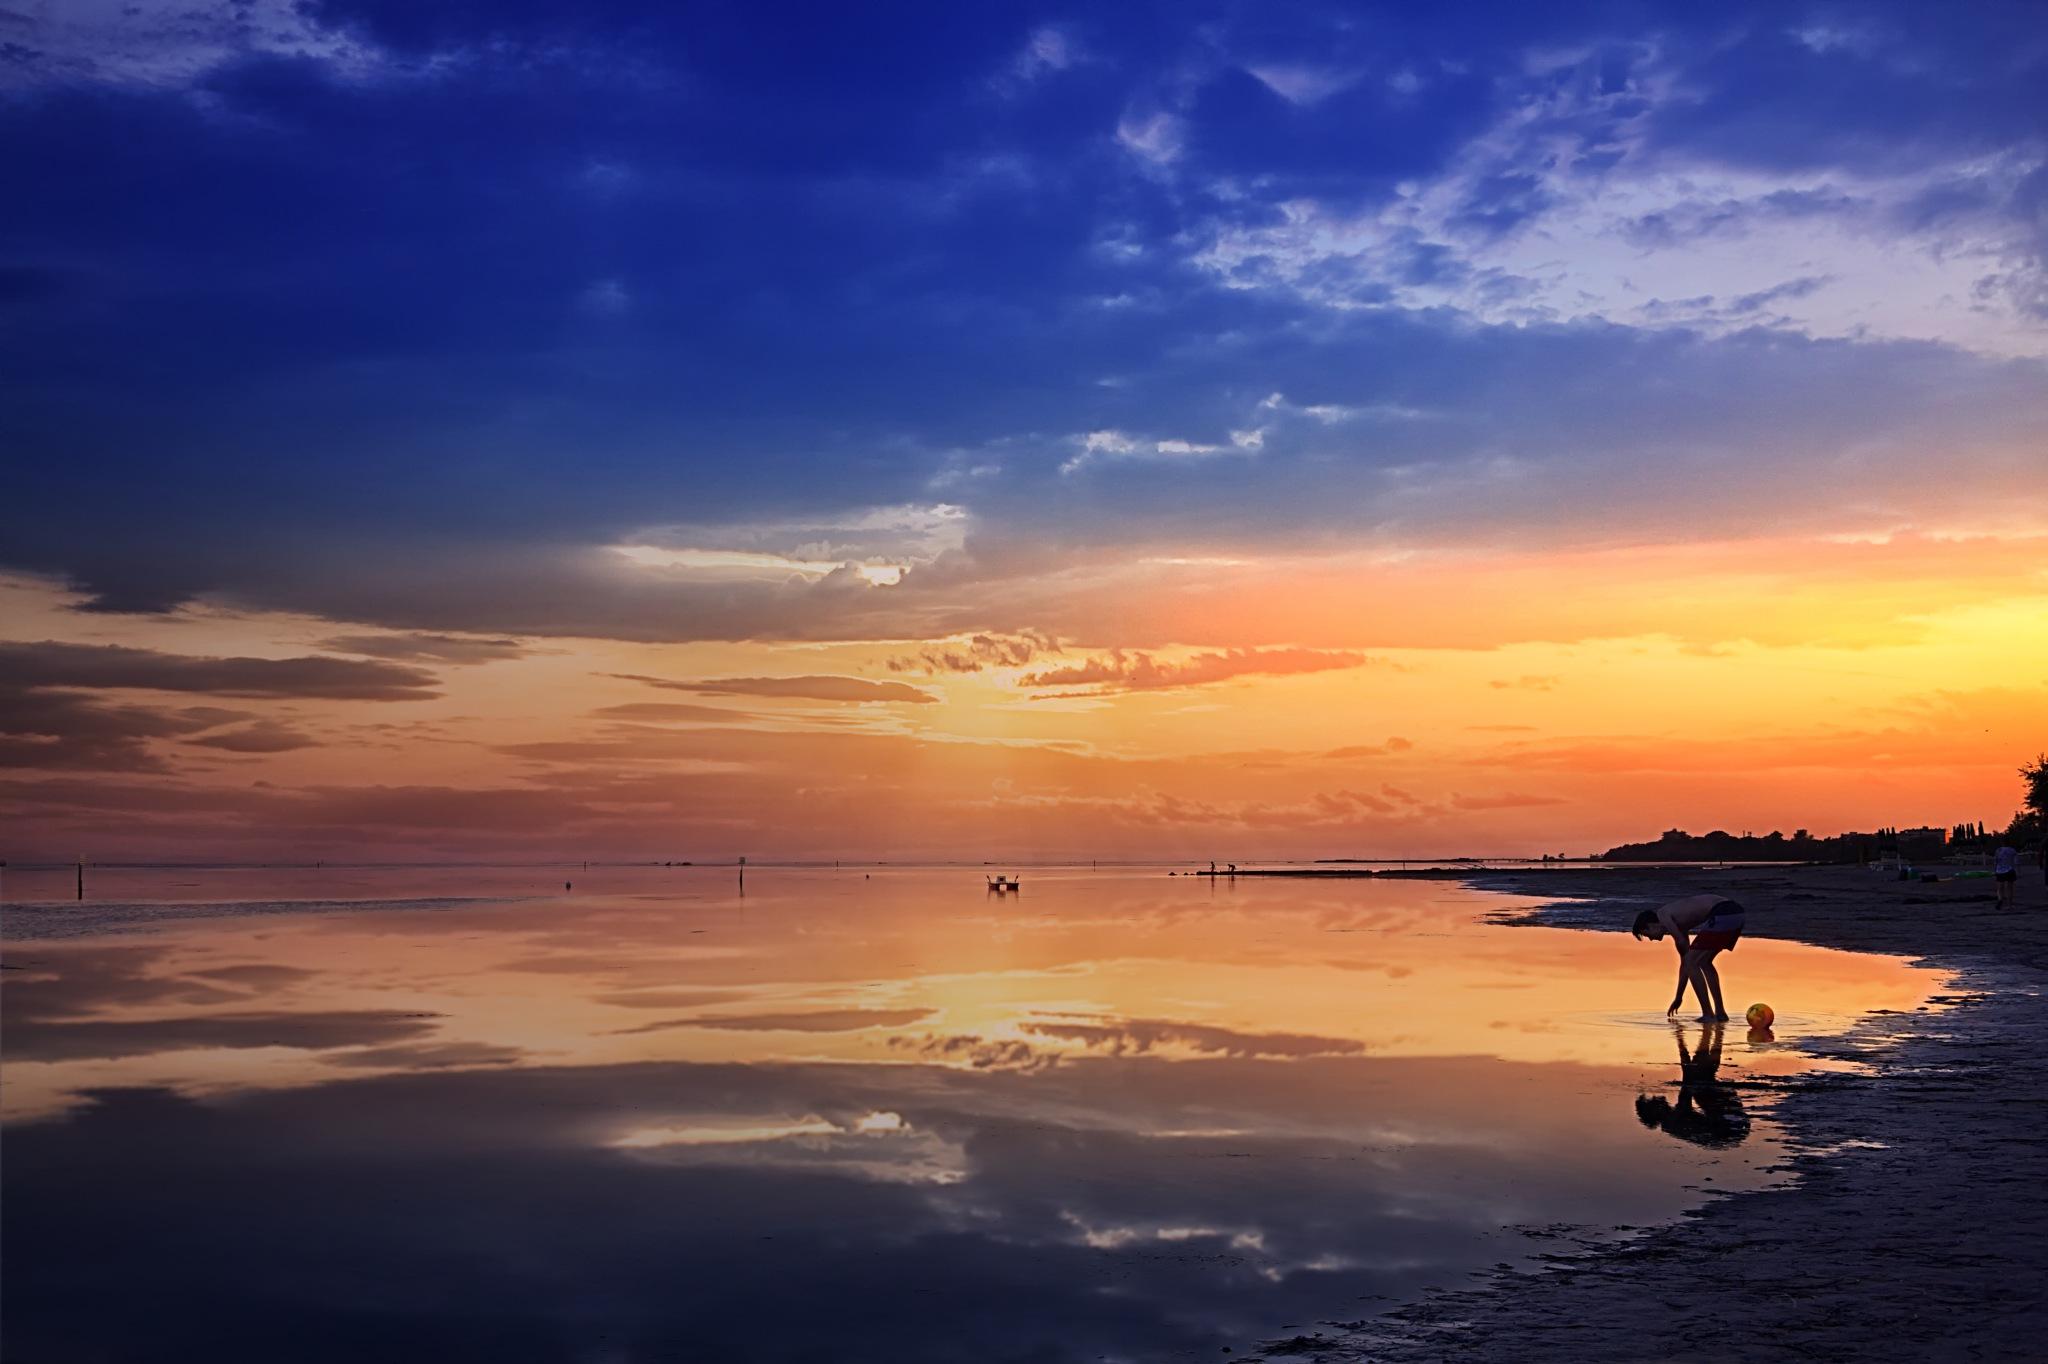 Sundown at the Beach by Michael Stapfer